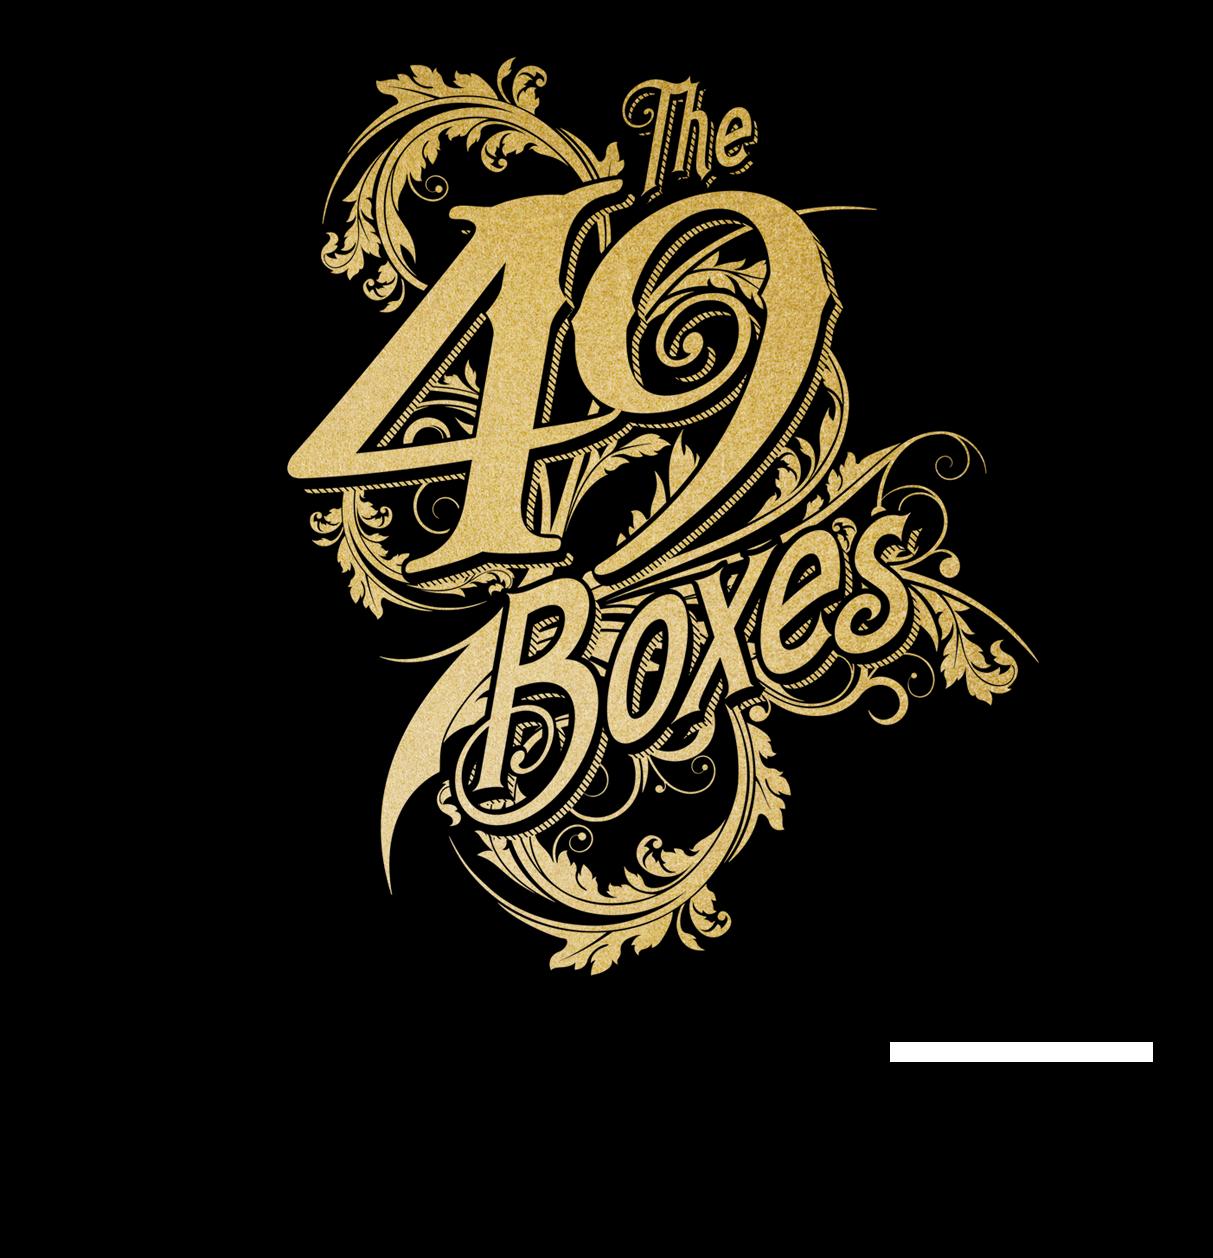 49boxes logo 02.png